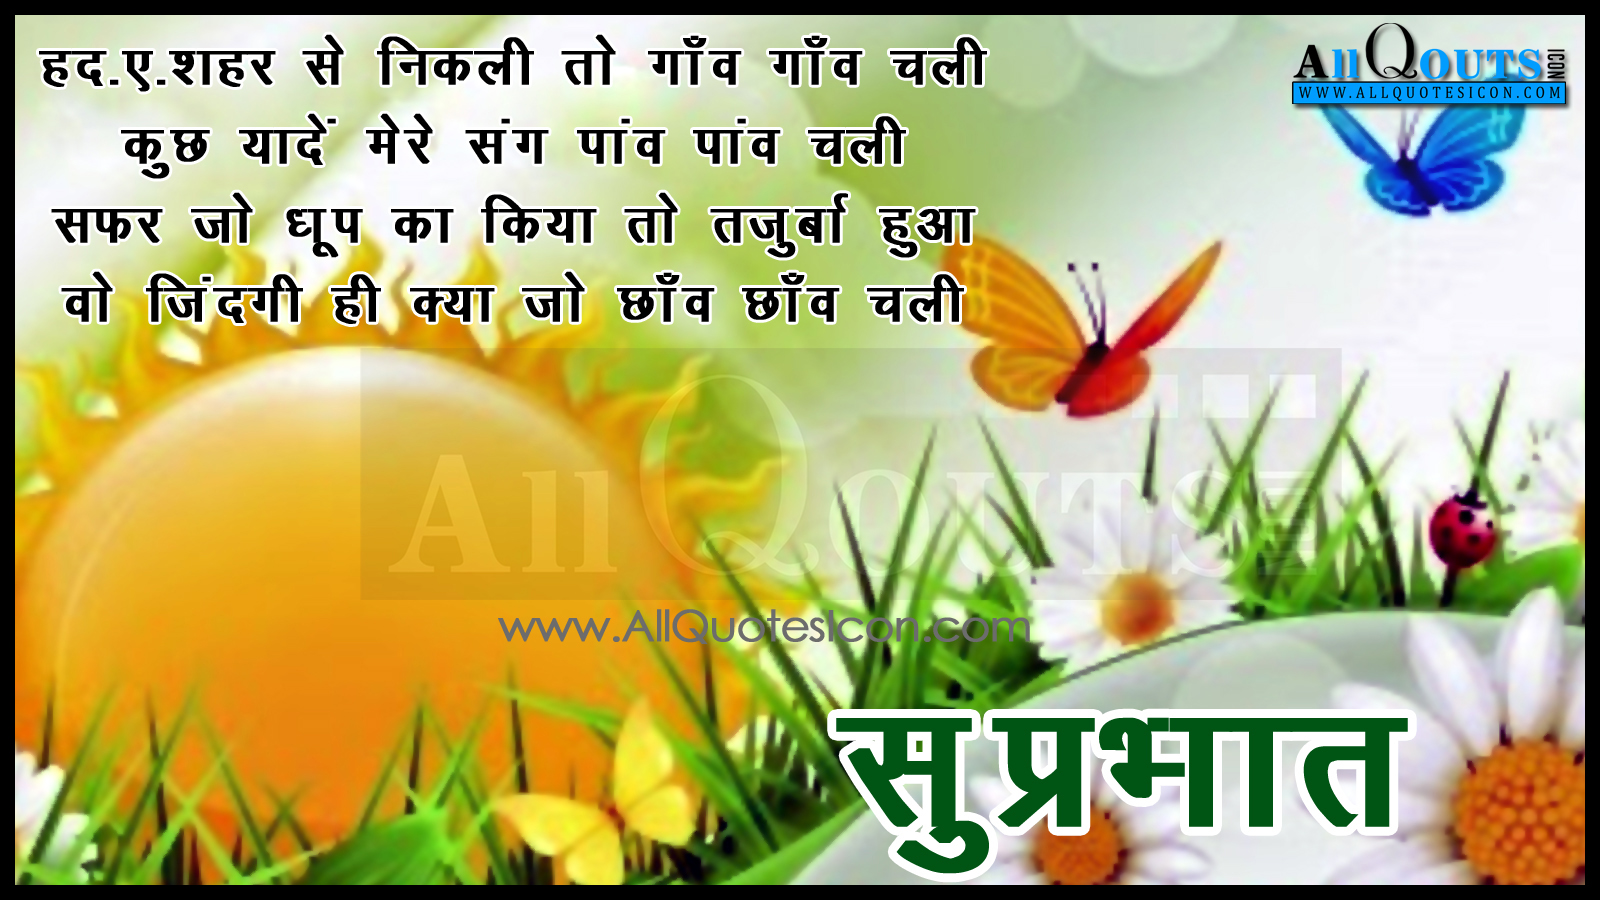 Best Good Morning Shayari and Images 174 Life Motivational